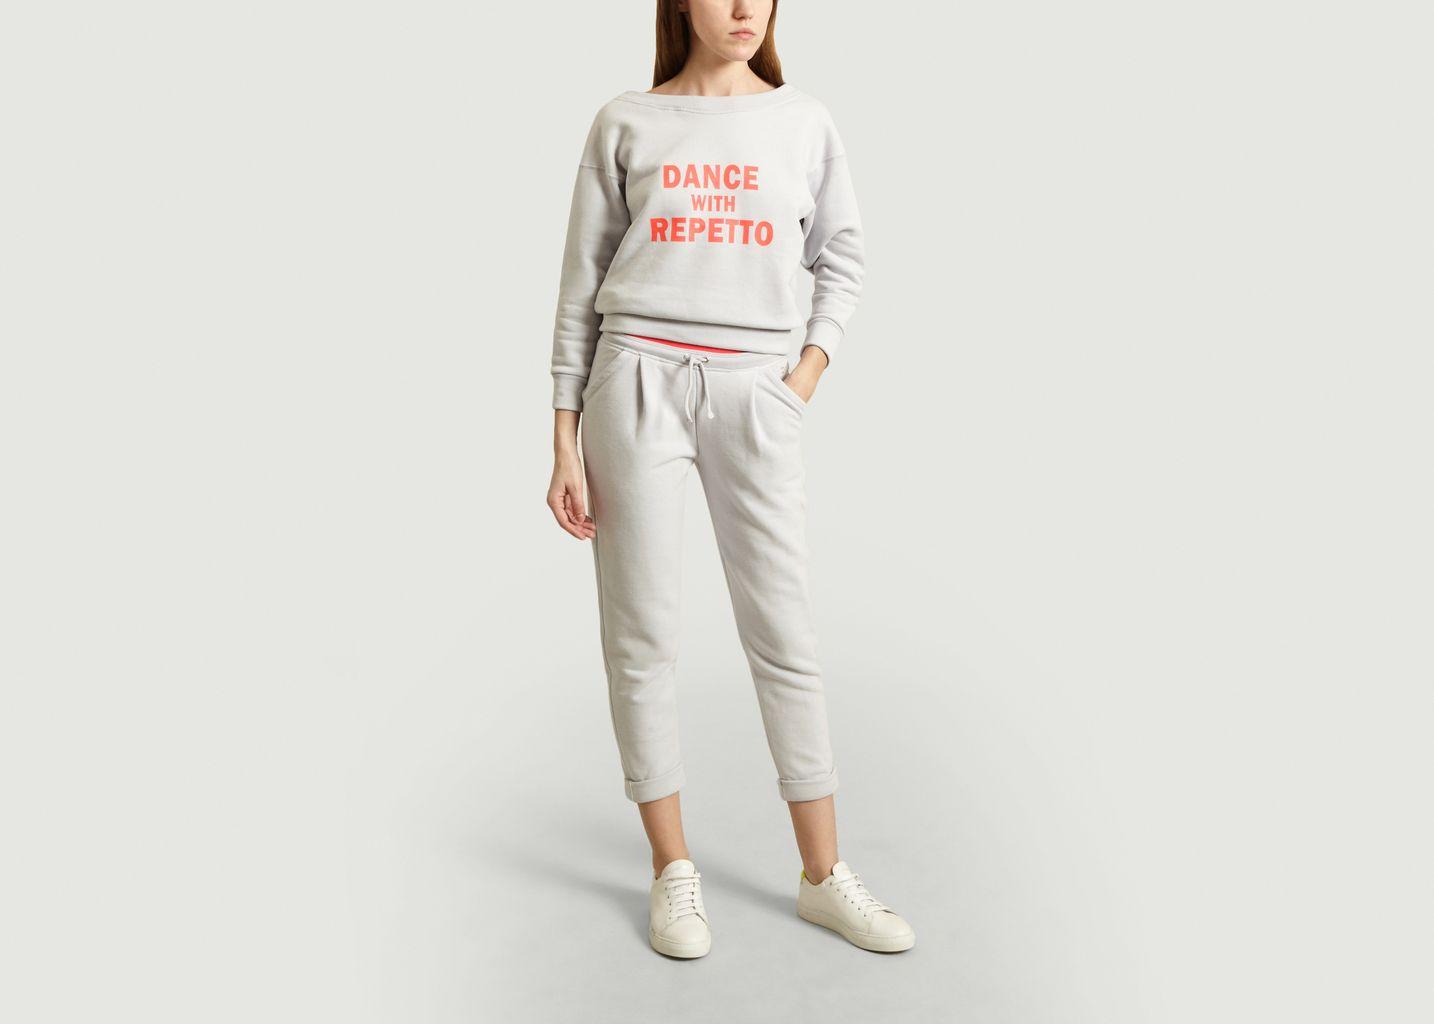 Pantalon De Jogging A Pinces 7/8e - Repetto